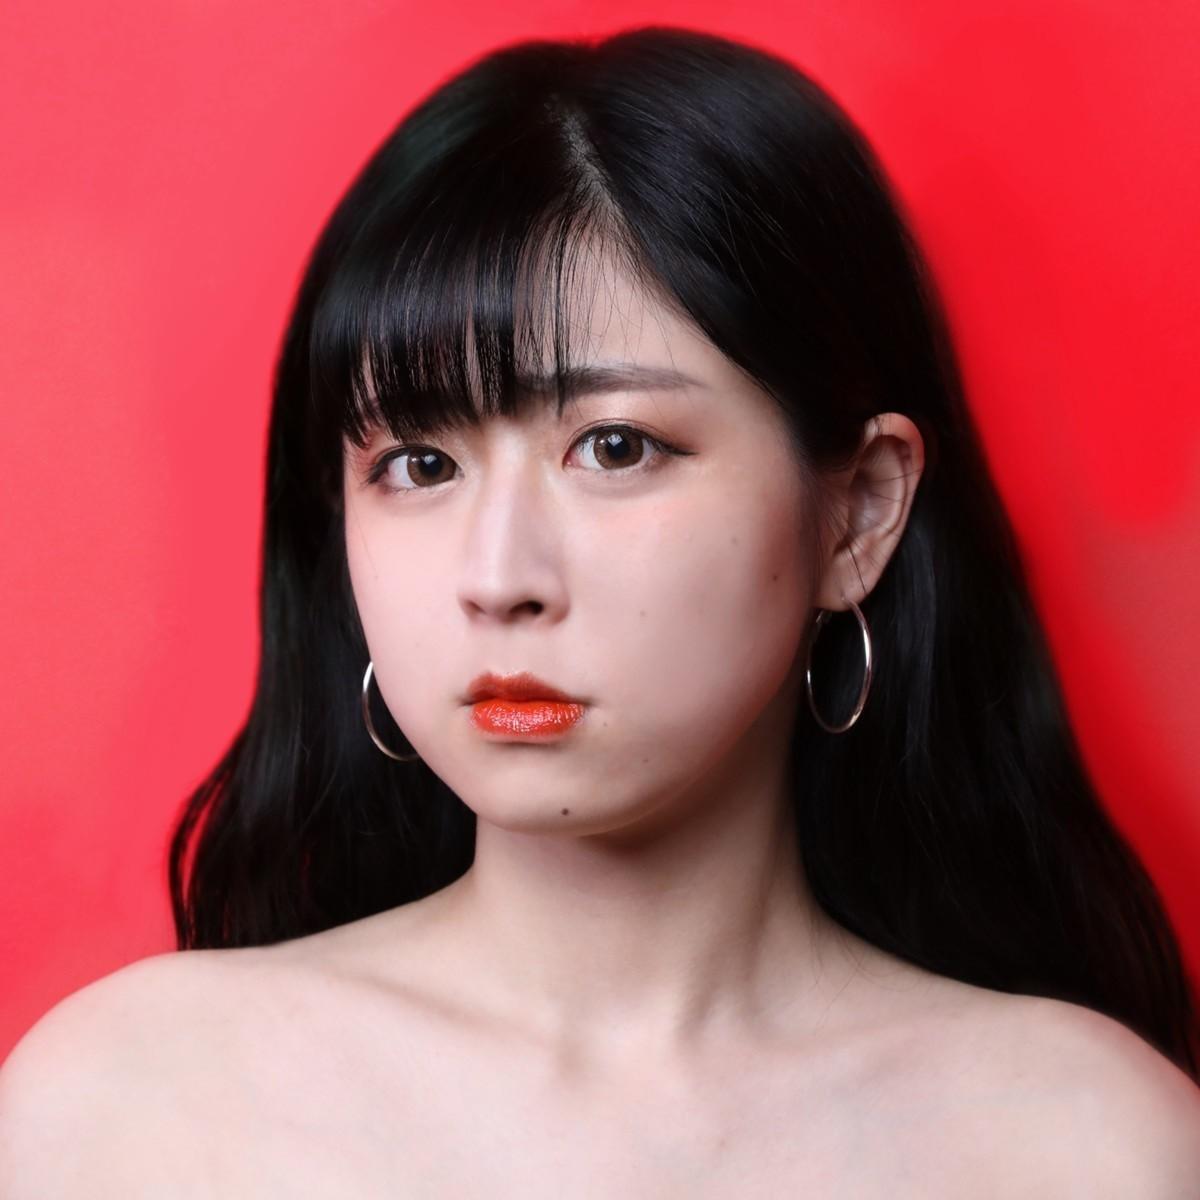 haruru犬love dog天使 – Lost Lost Dust Dream [FLAC + MP3 320 / WEB] [2018.11.07]